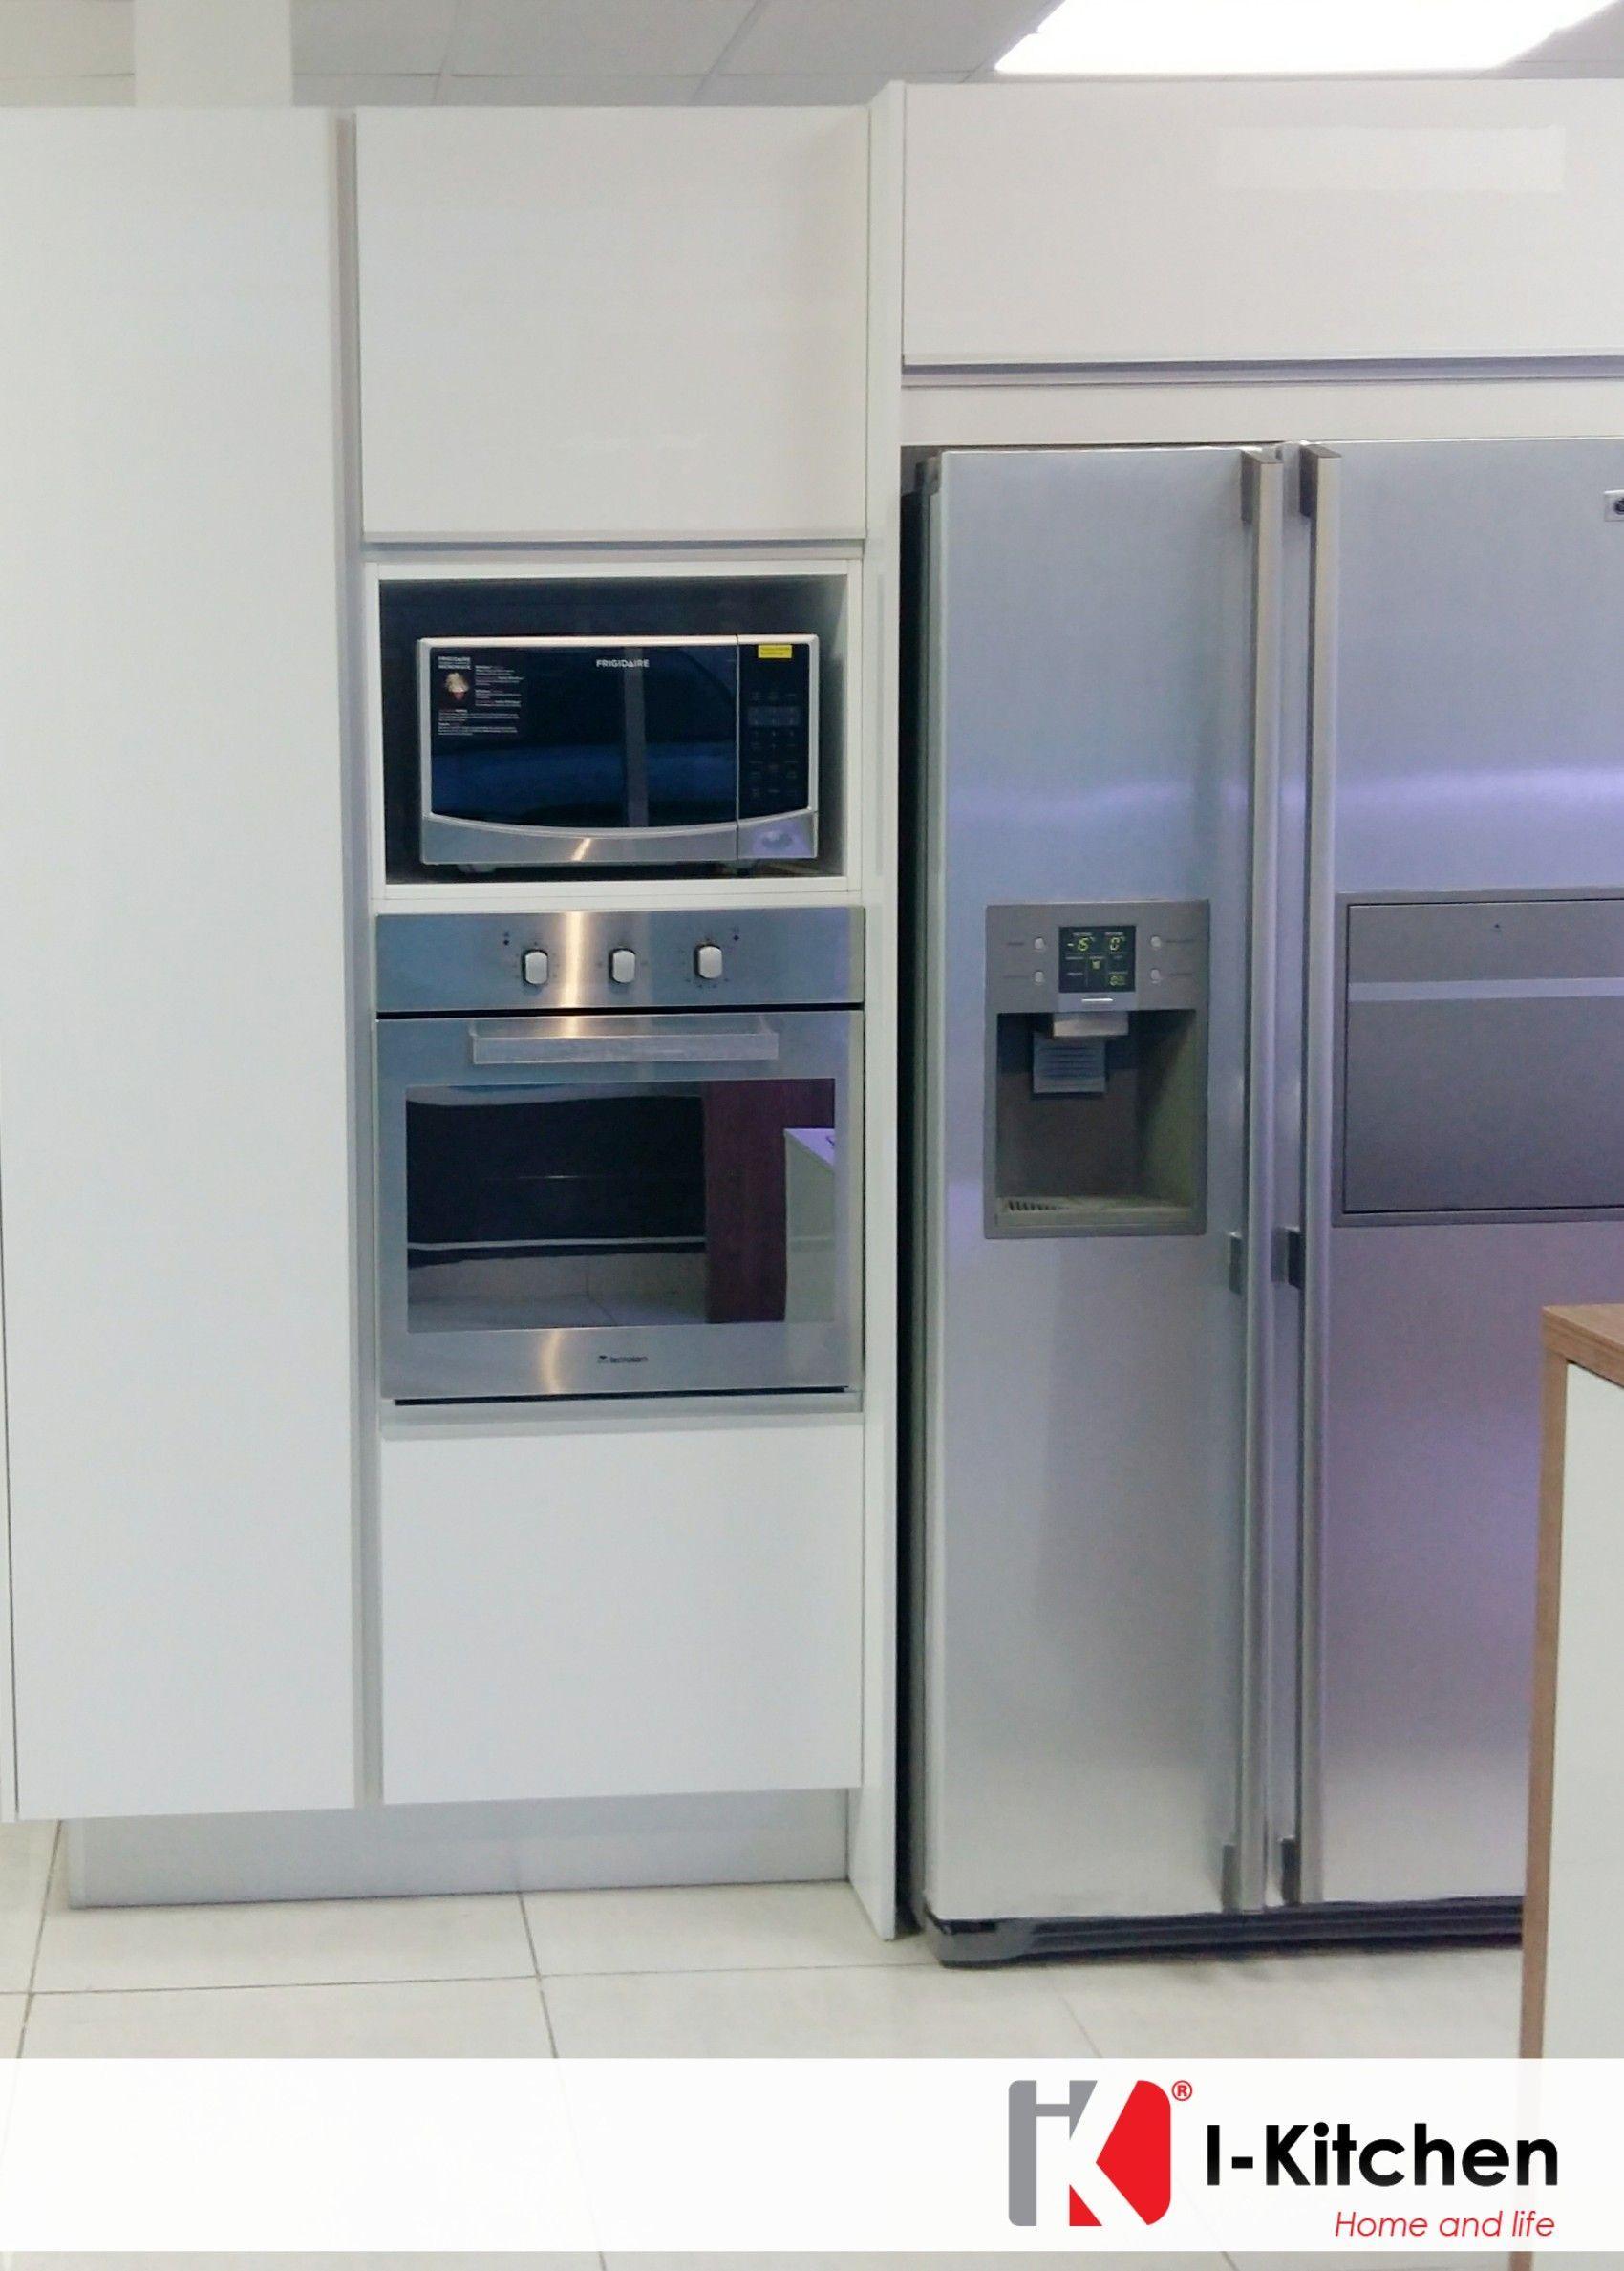 Hermosa cocina con empotrado de nevera horno y microondas - Cocina en microondas ...